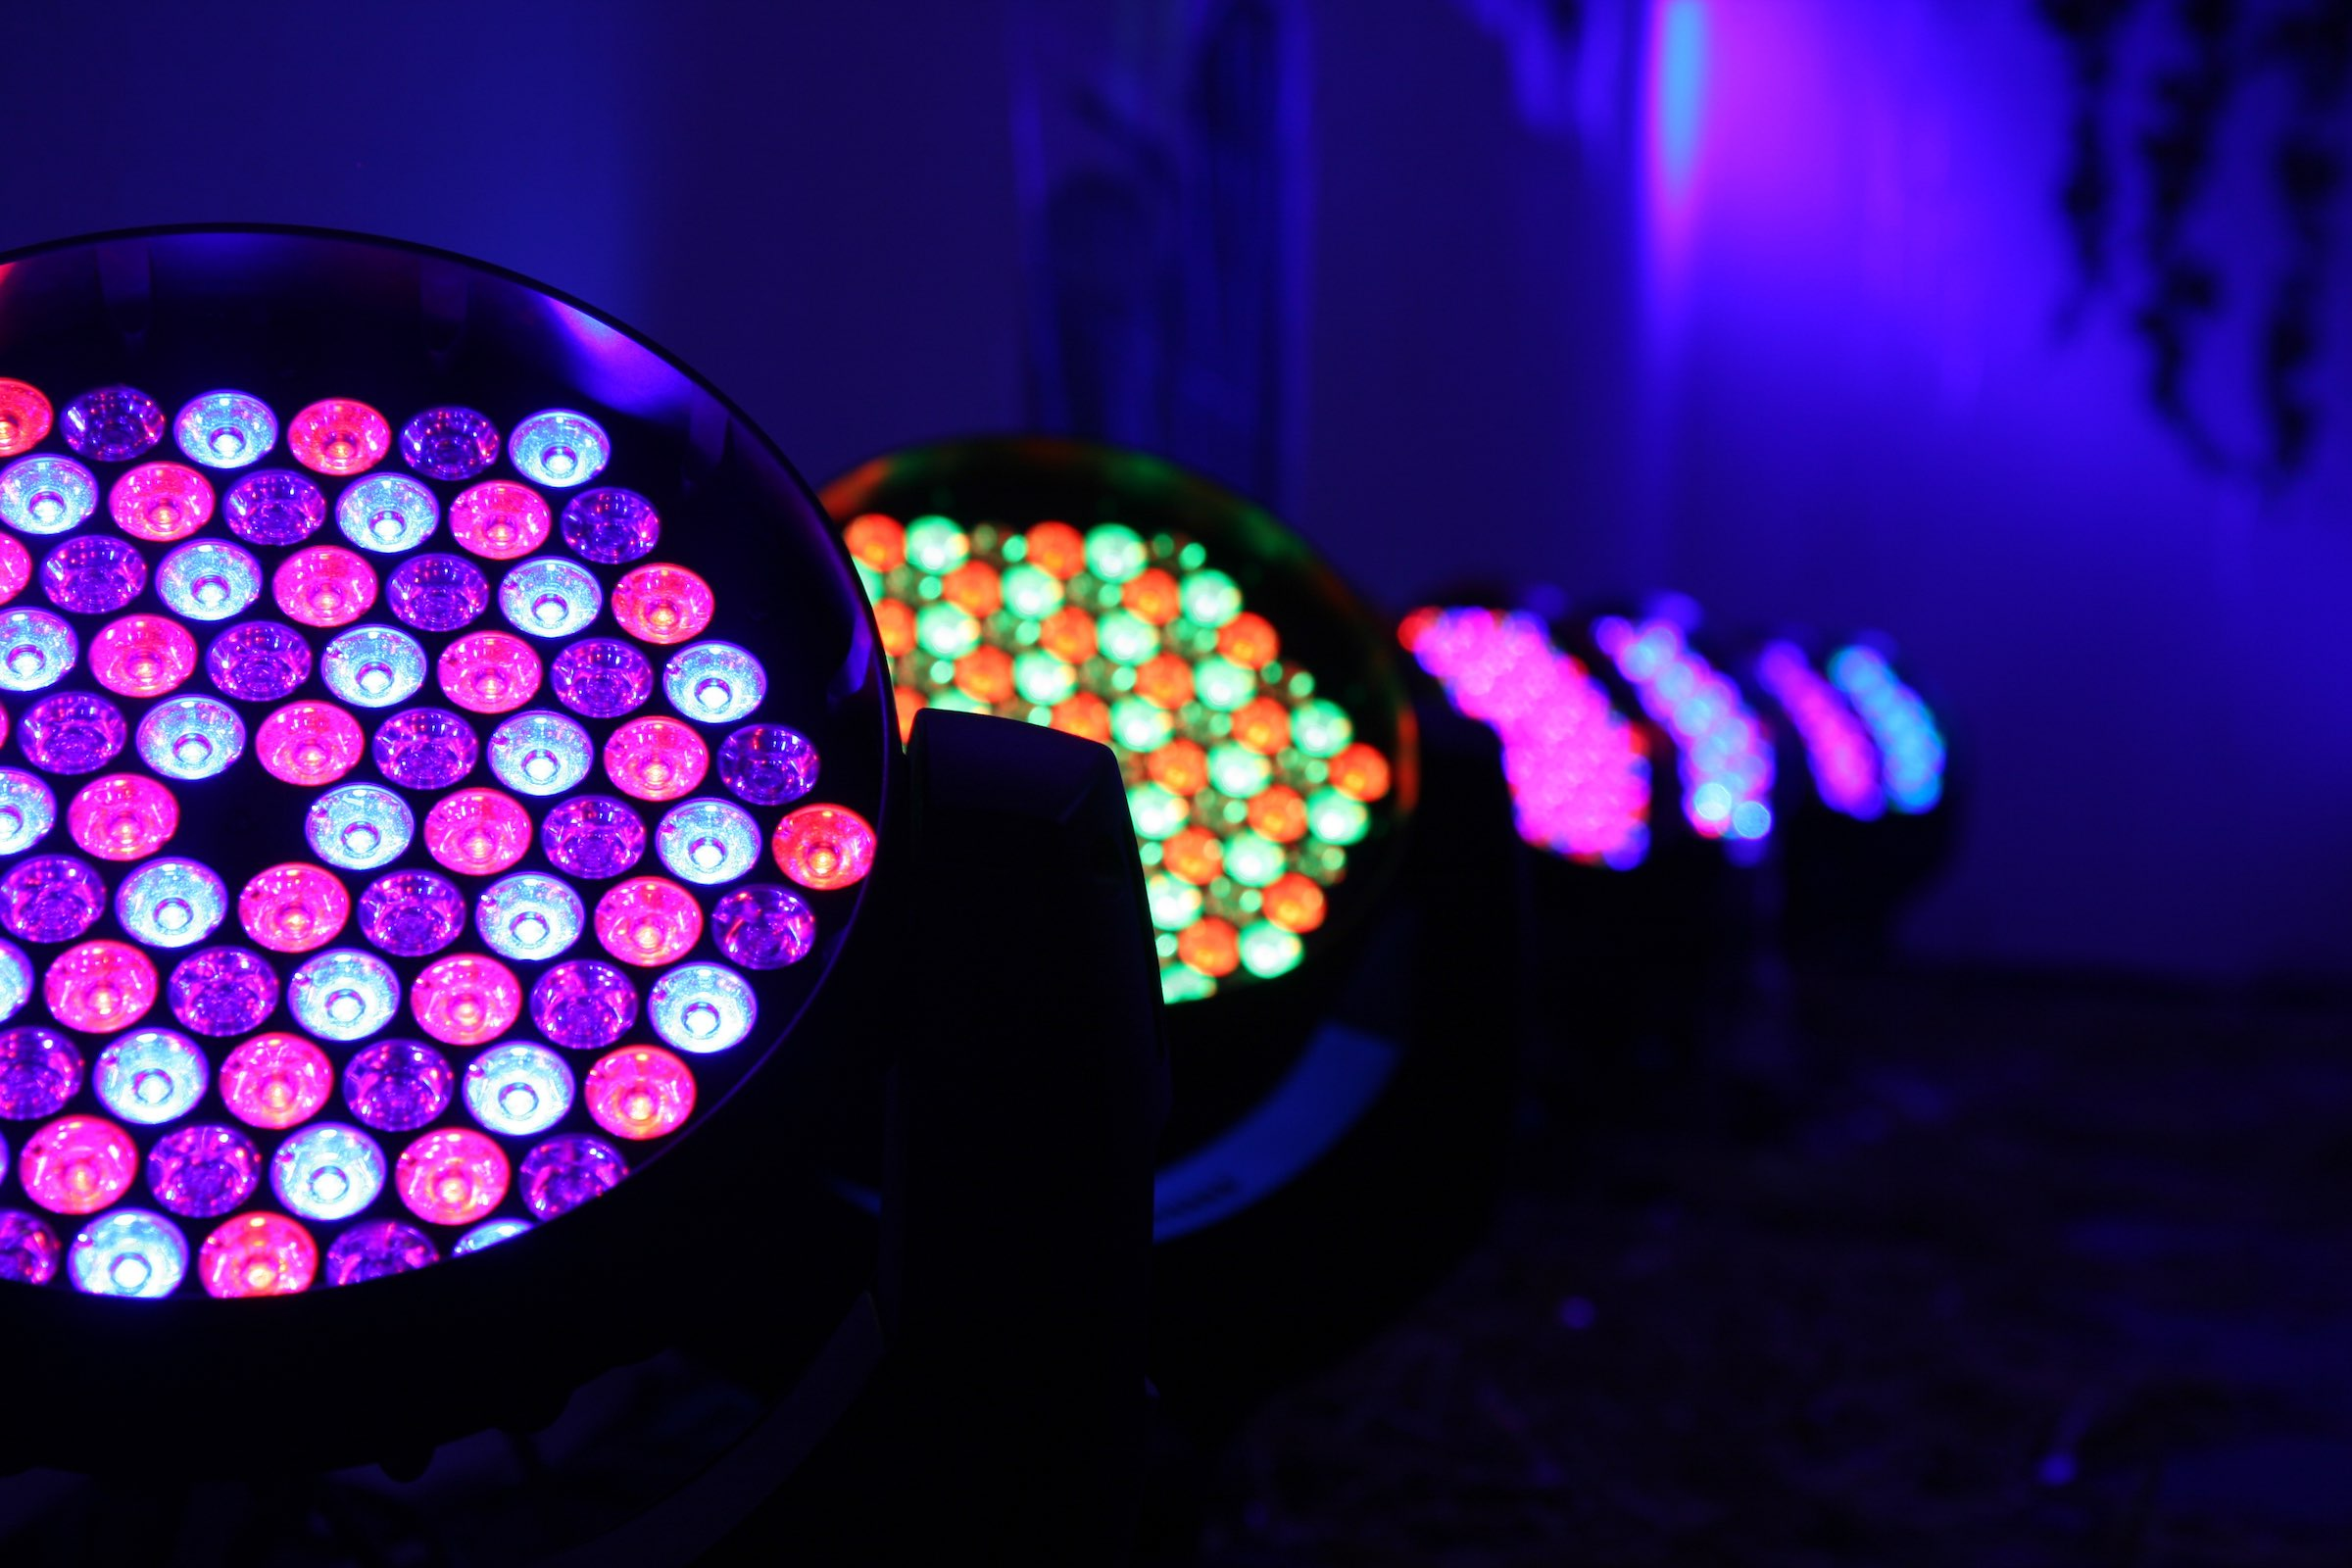 Beleuchtung | Hochzeit | Messe | Firmenveranstaltung | Indoor | Outdoor | LED | Raumbeleuchtung | Lichttechnik | Ambientebeleuchtung | Uplight | Buchen | Mieten | Anfragen | Lehmann | Eventservice